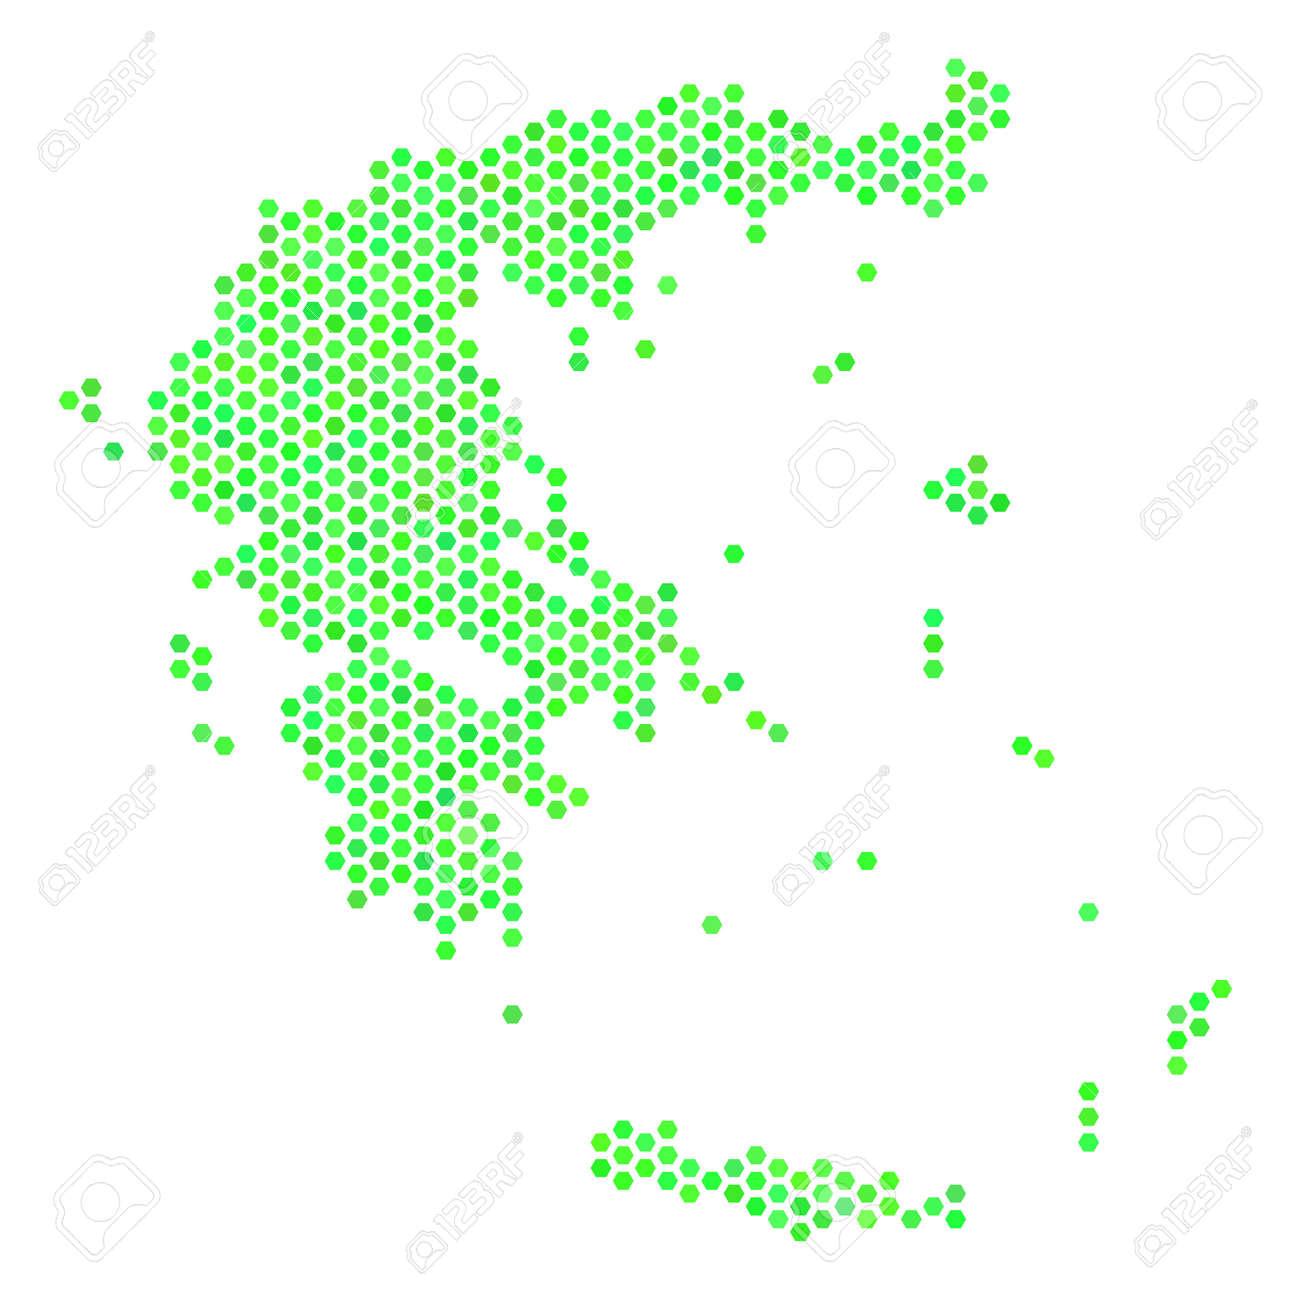 Fresh Green Greece Map. Vector Hex Tile Territorial Map Using ...